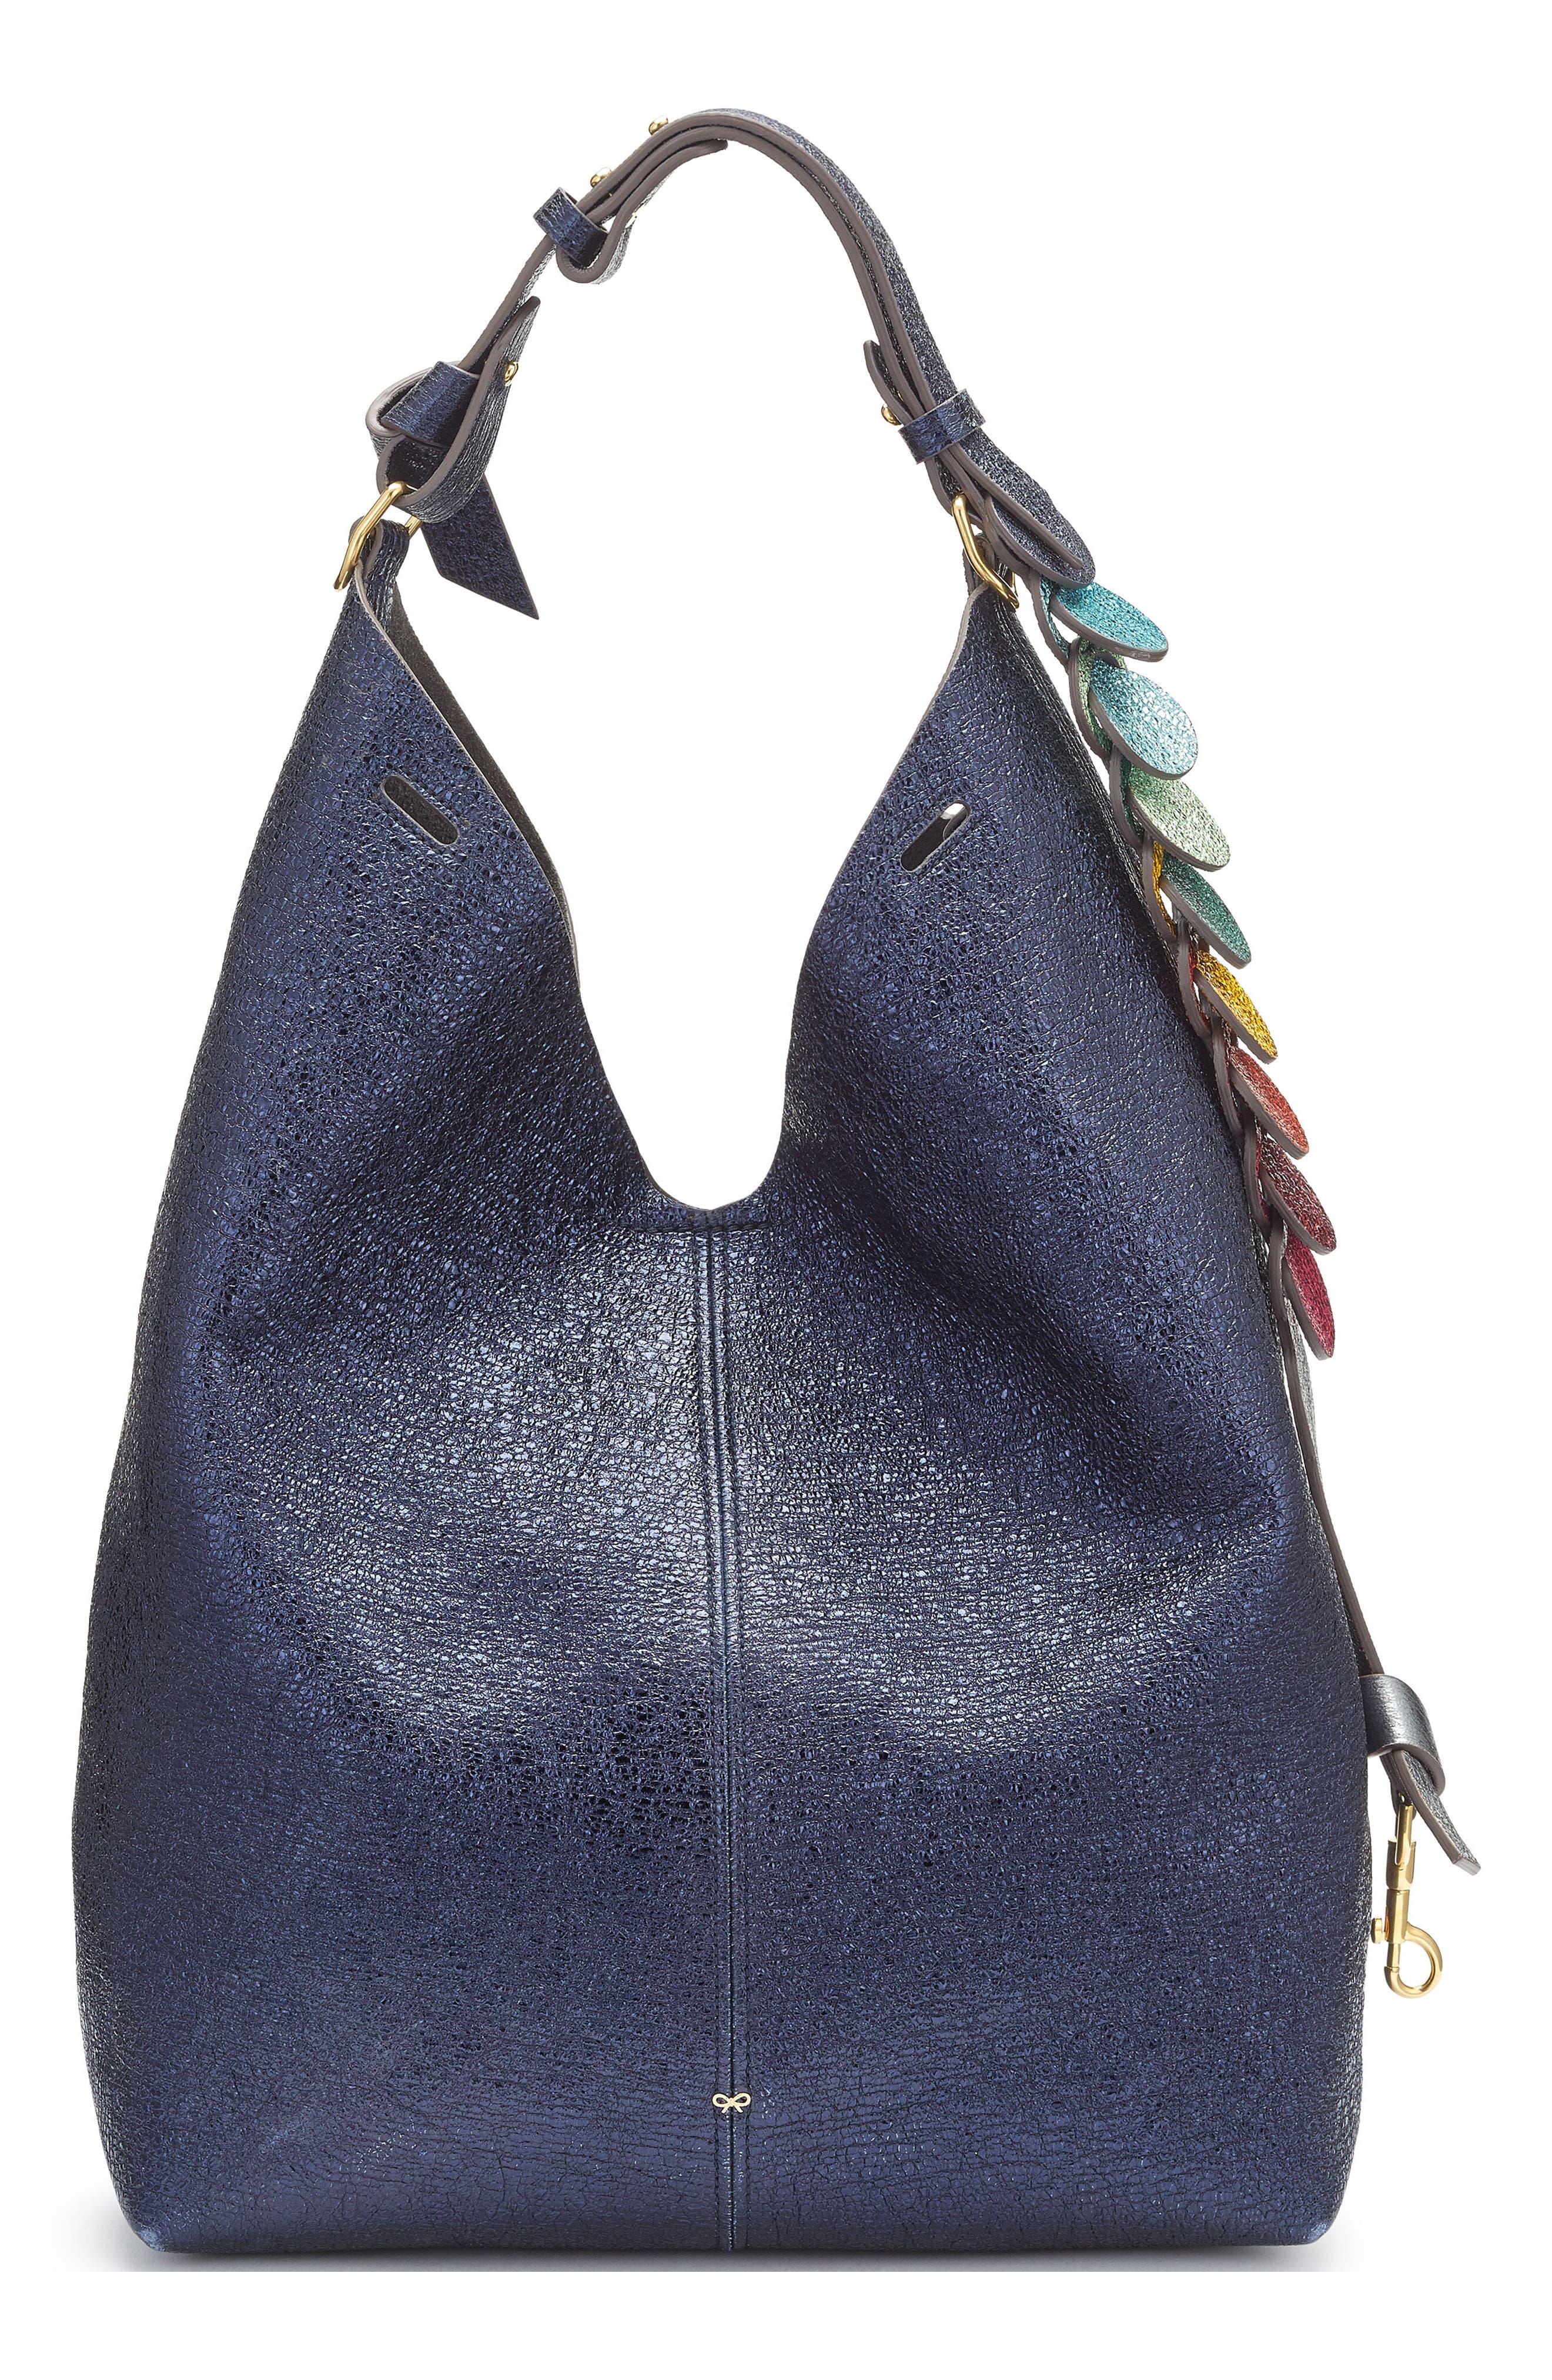 anya hindmarch small circles leather bucket bag